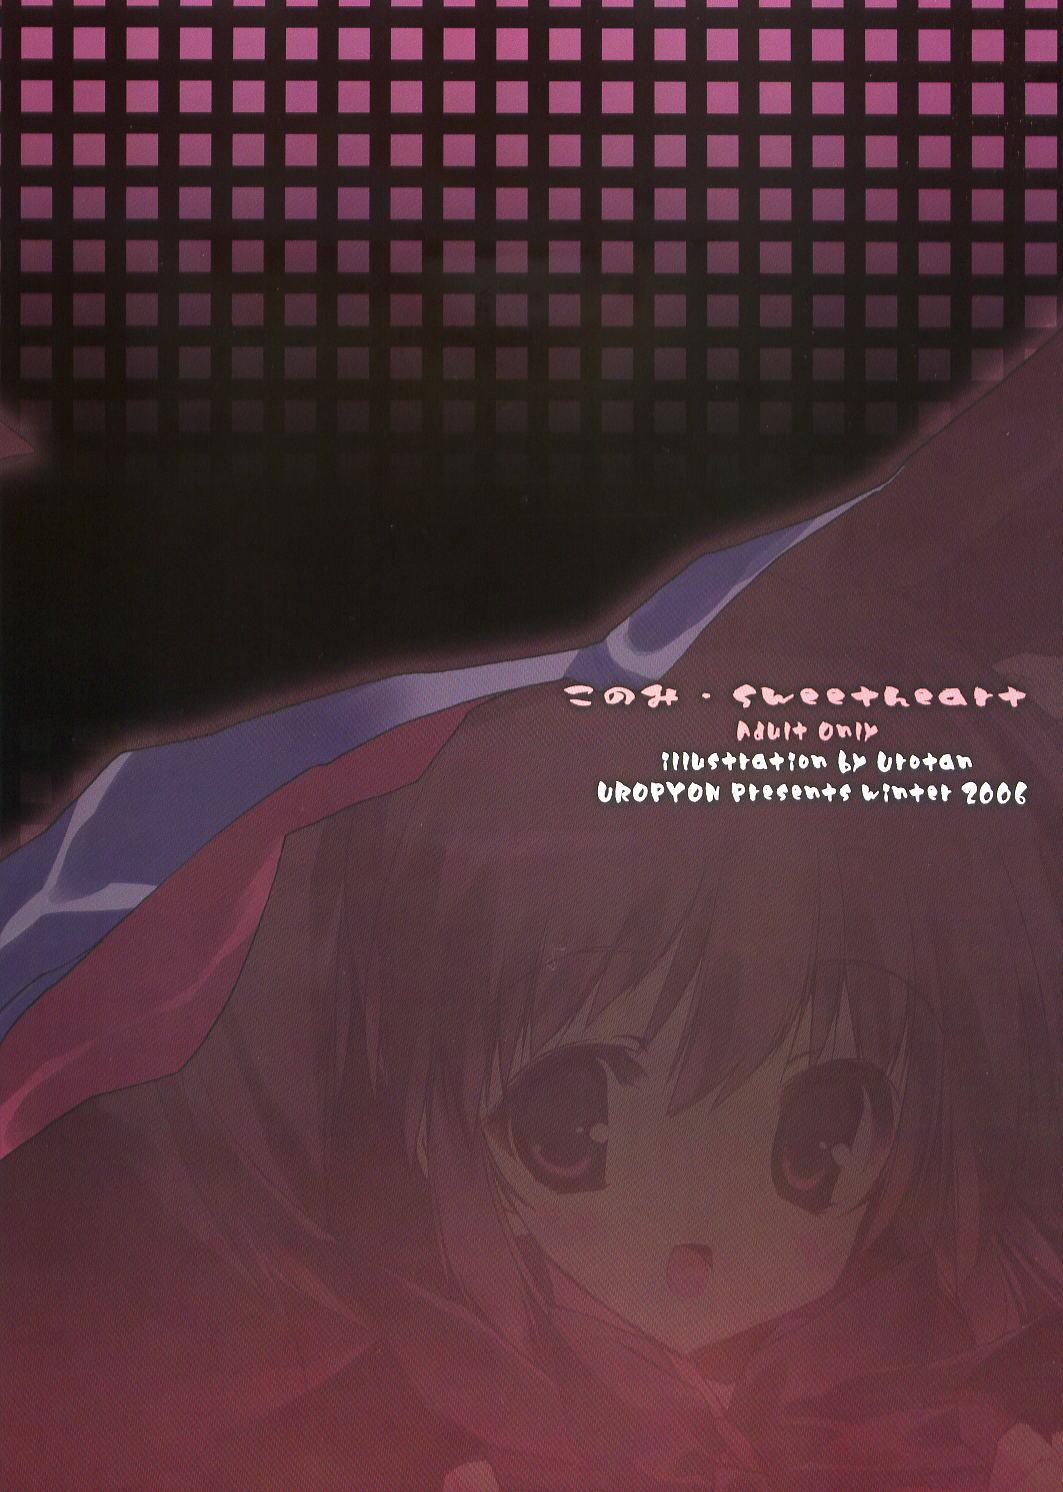 Konomi Sweetheart 21